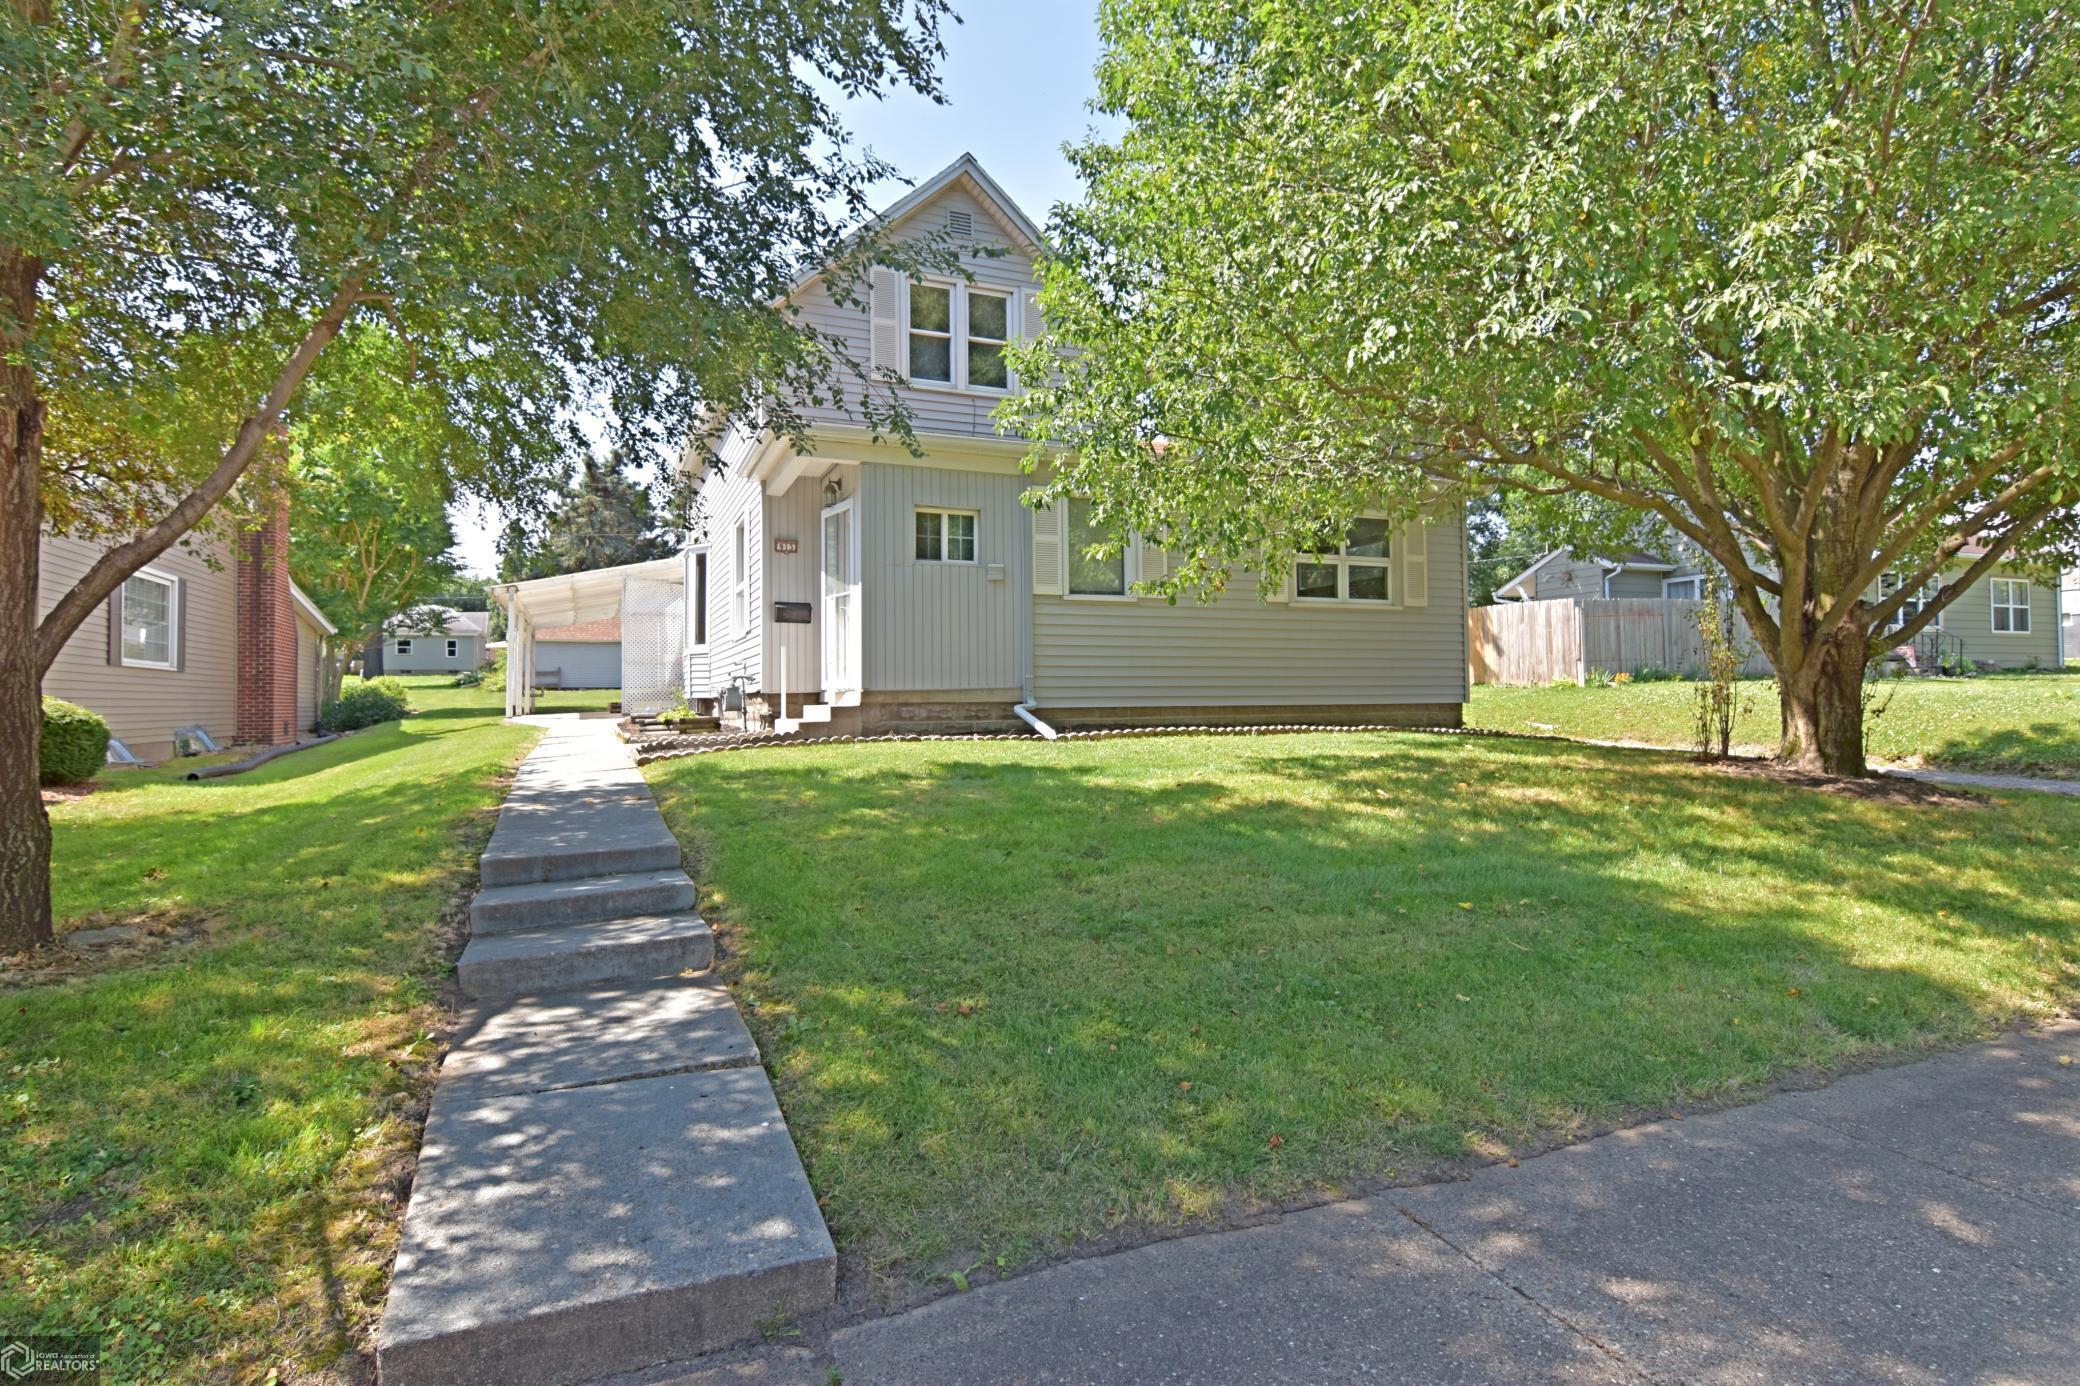 913 May Property Photo - Marshalltown, IA real estate listing